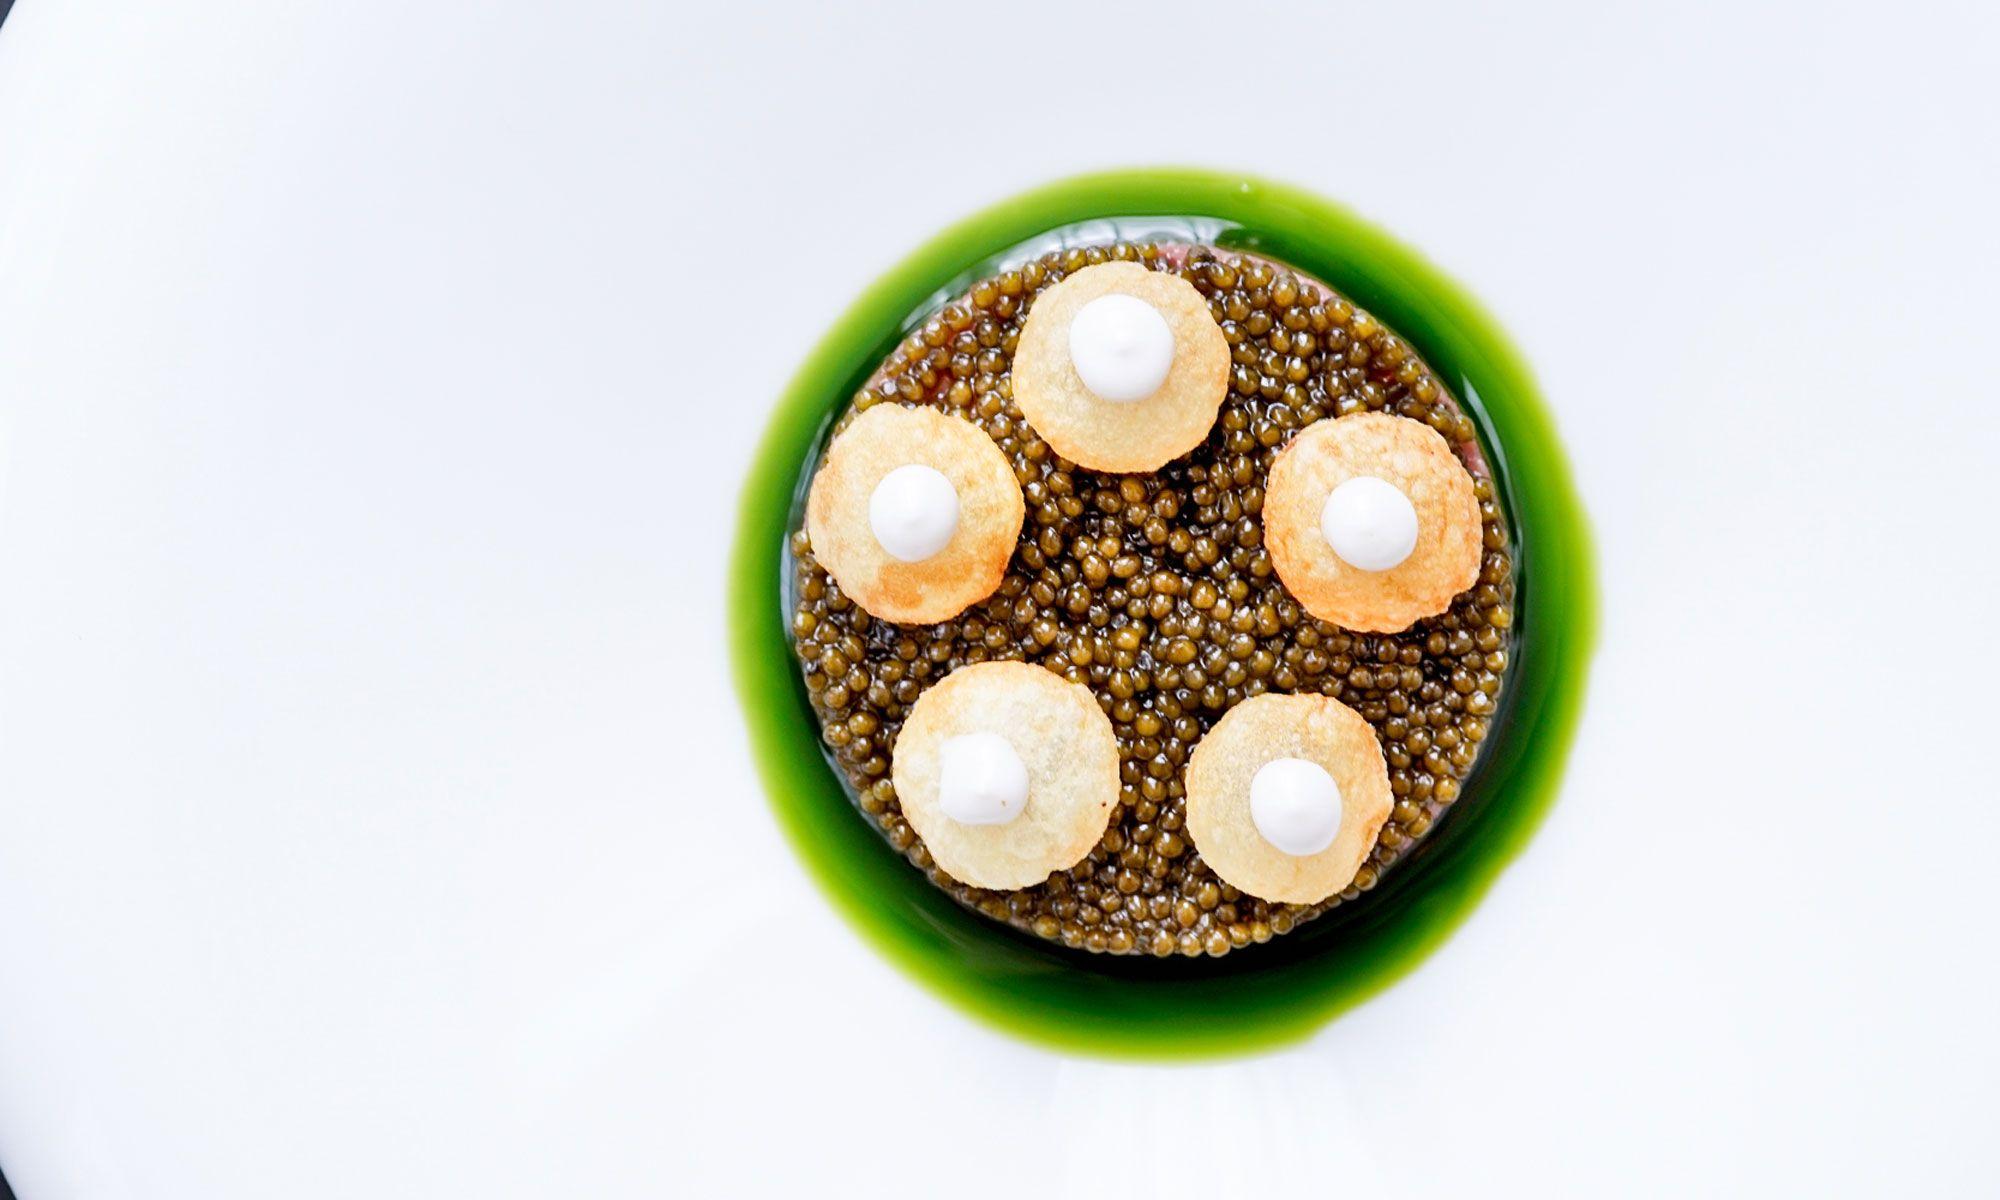 Le Pan Presents Kaviari Plantin Dinner This March